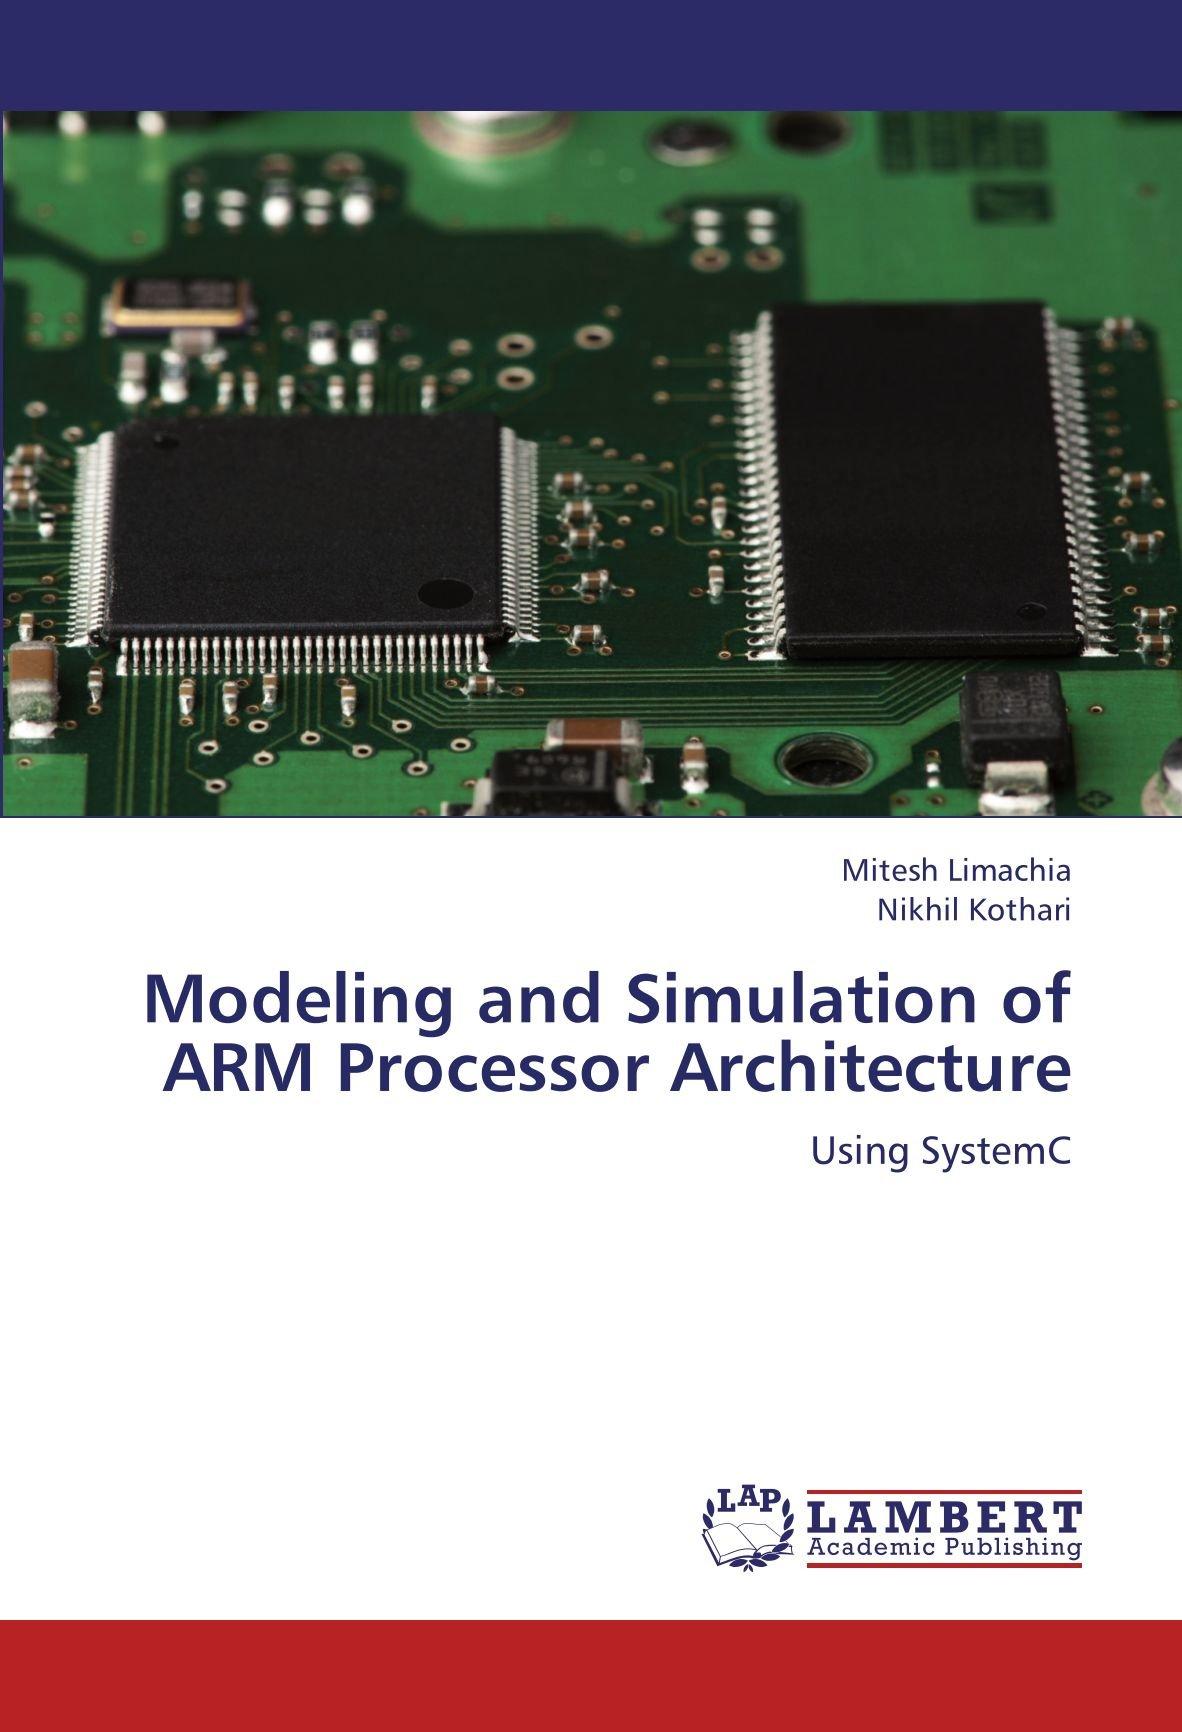 Modeling And Simulation Of ARM Processor Architecture: Using SystemC:  Mitesh Limachia, Nikhil Kothari: 9783659120886: Amazon.com: Books